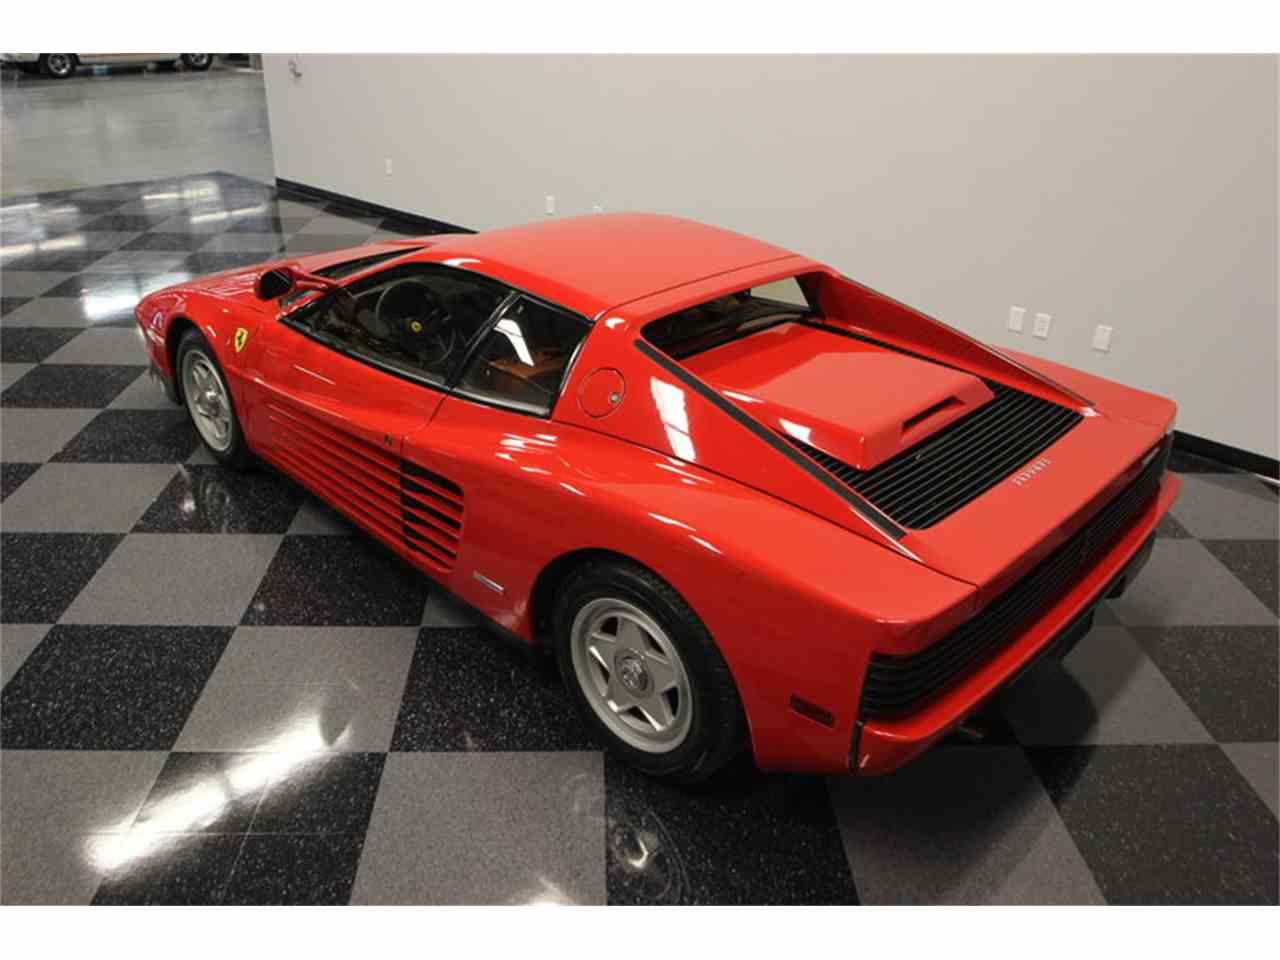 Large Picture of '86 Ferrari Testarossa located in Florida - $159,995.00 - FNNC